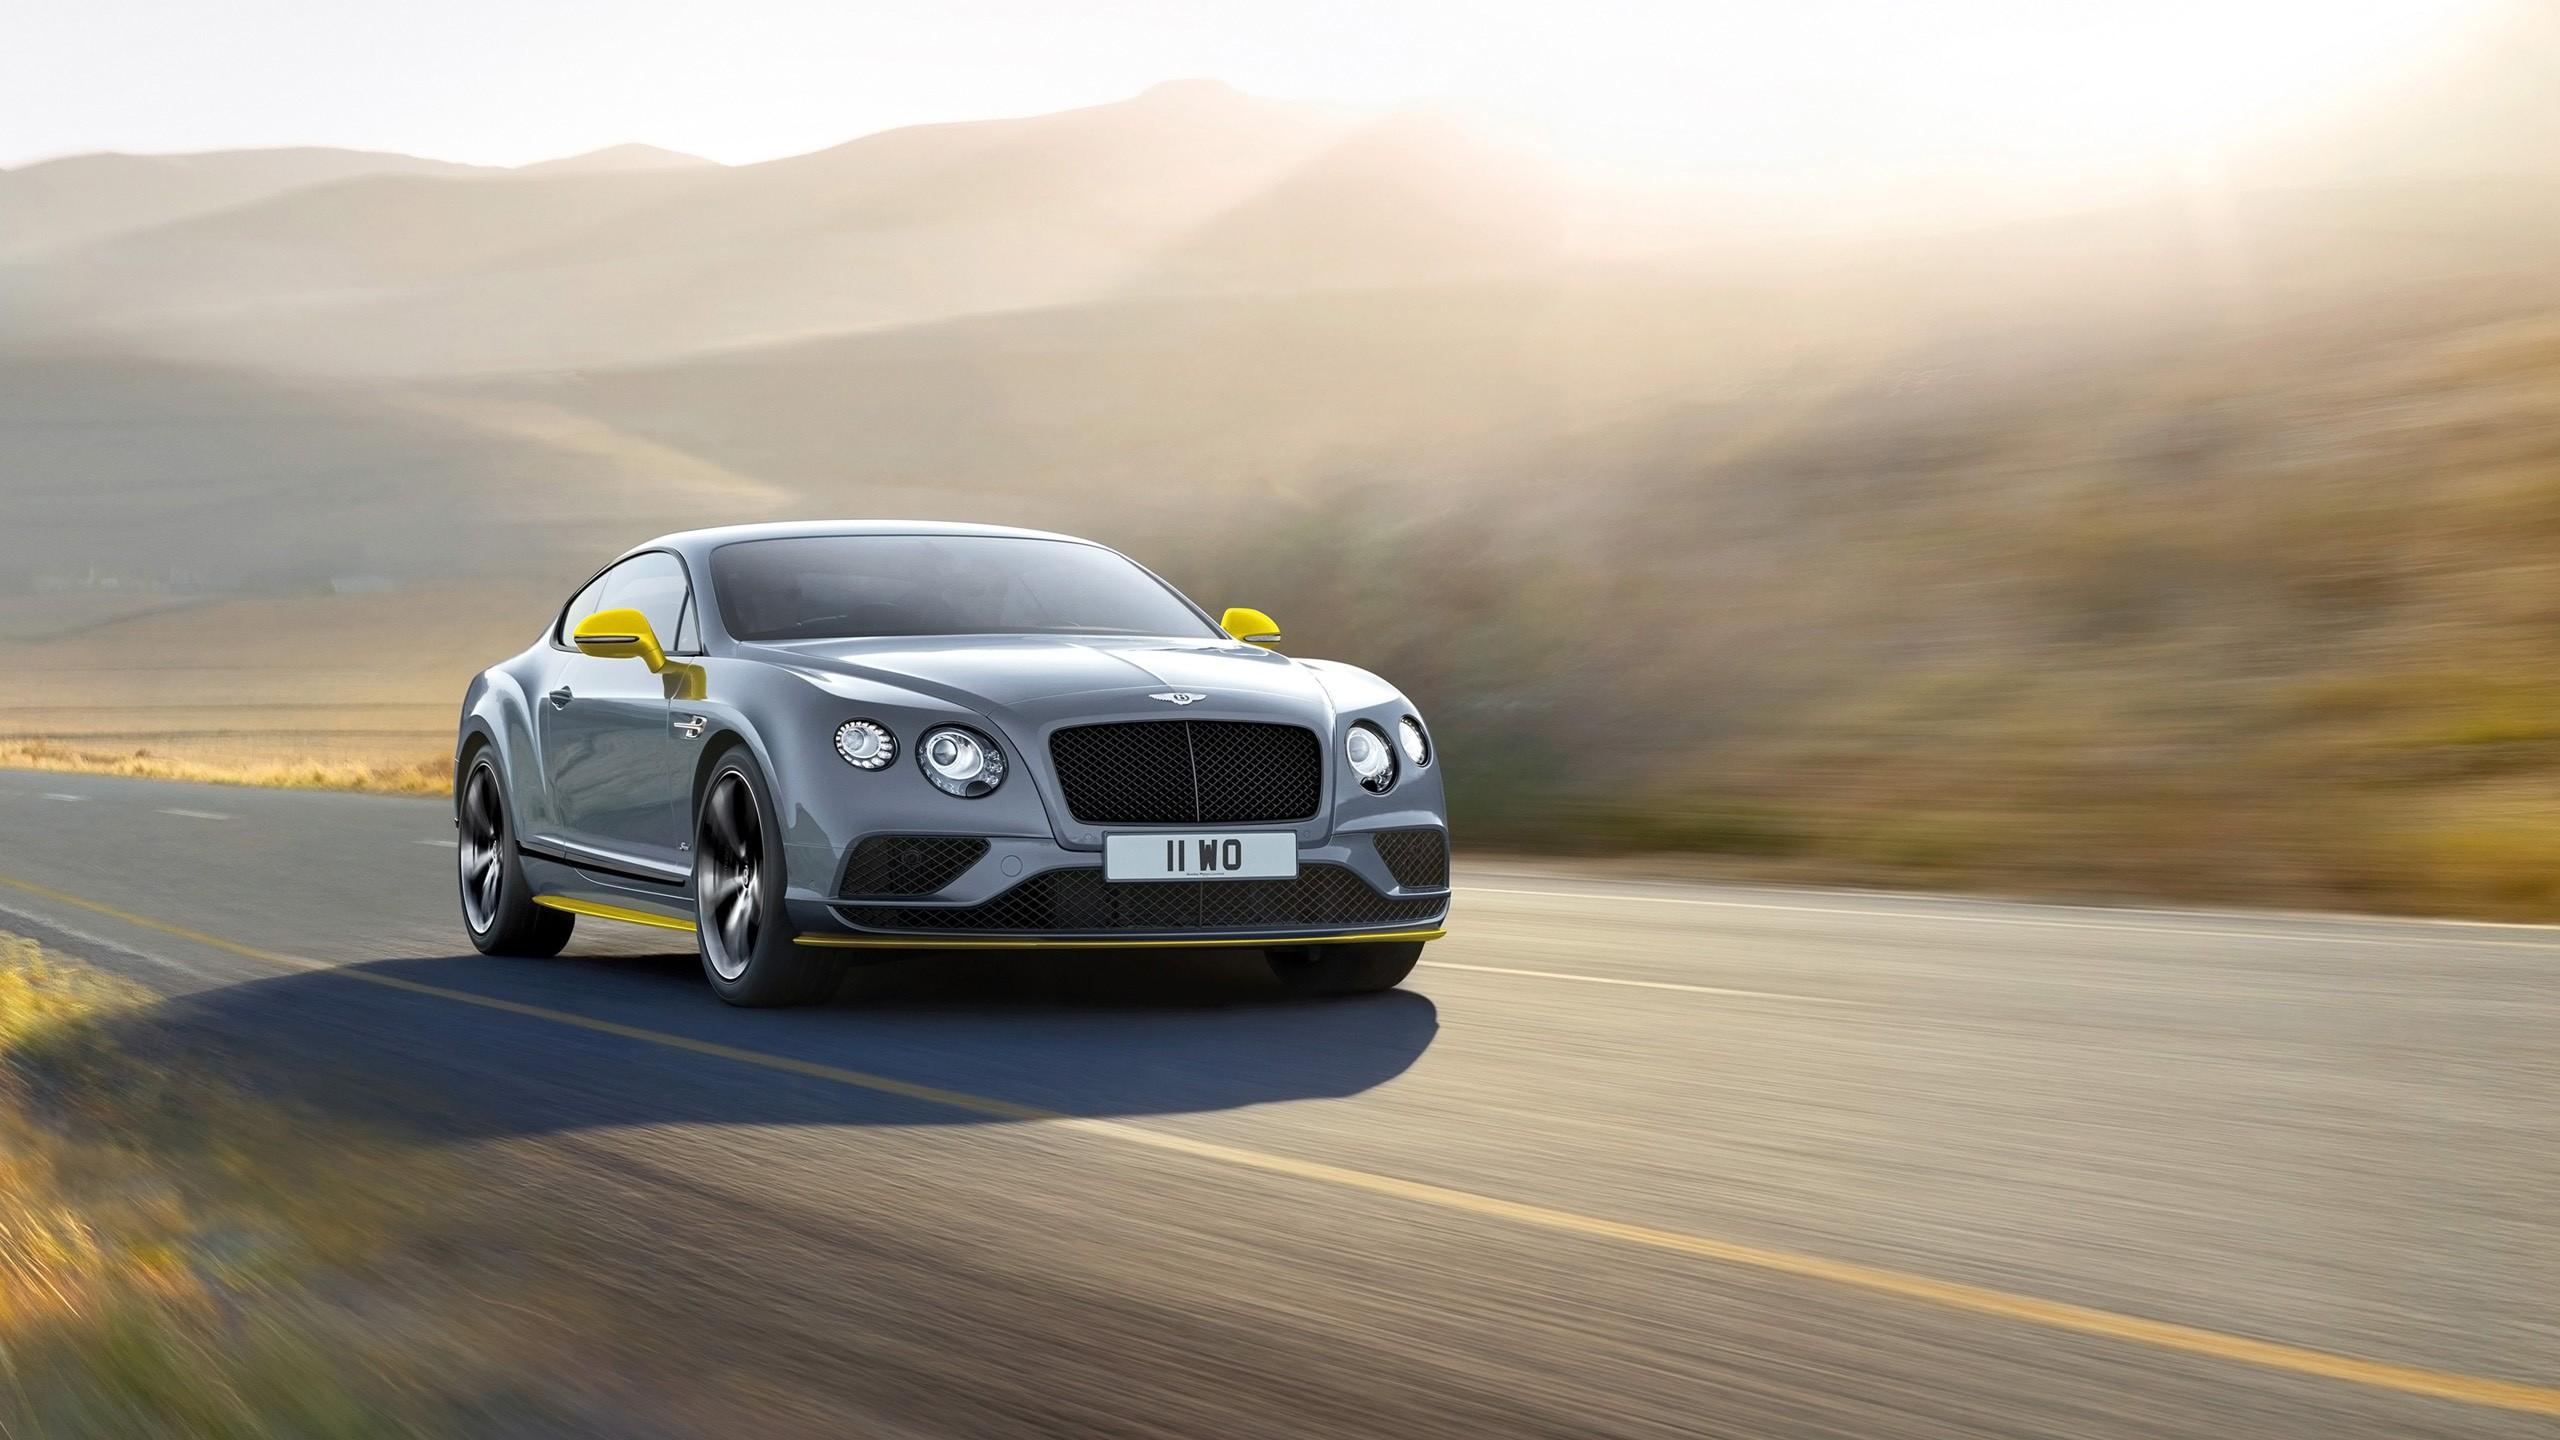 2016 Bentley Continental Gt Speed Black Edition Wallpaper Hd Car Wallpapers Id 6405